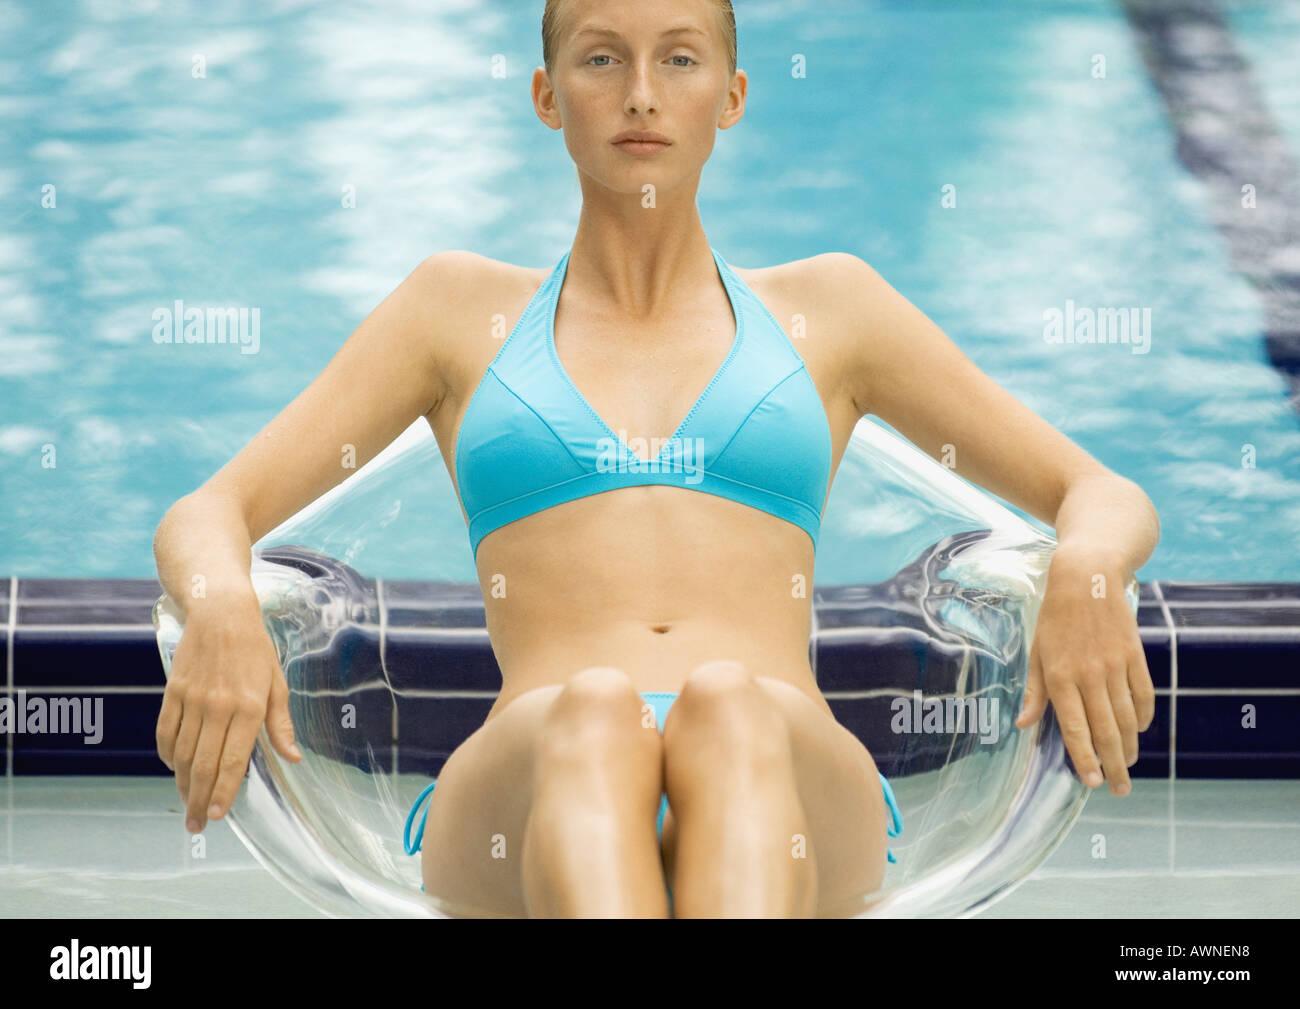 Mujer en bikini sentada en la silla transparente por la piscina Foto de stock